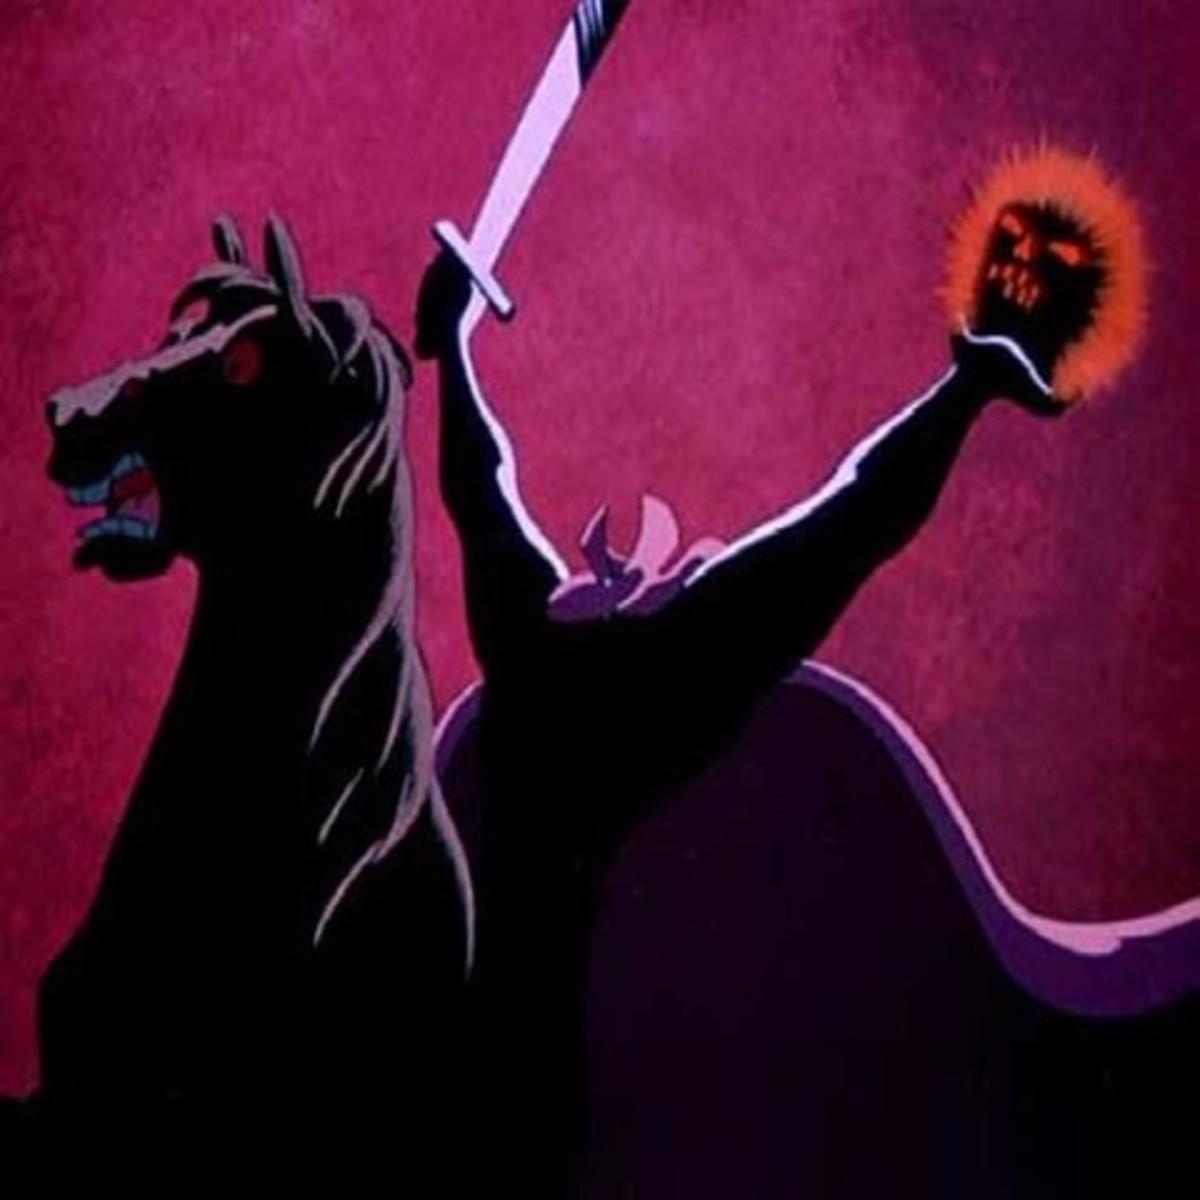 The Headless Horseman - The Legend of Sleepy Hollow